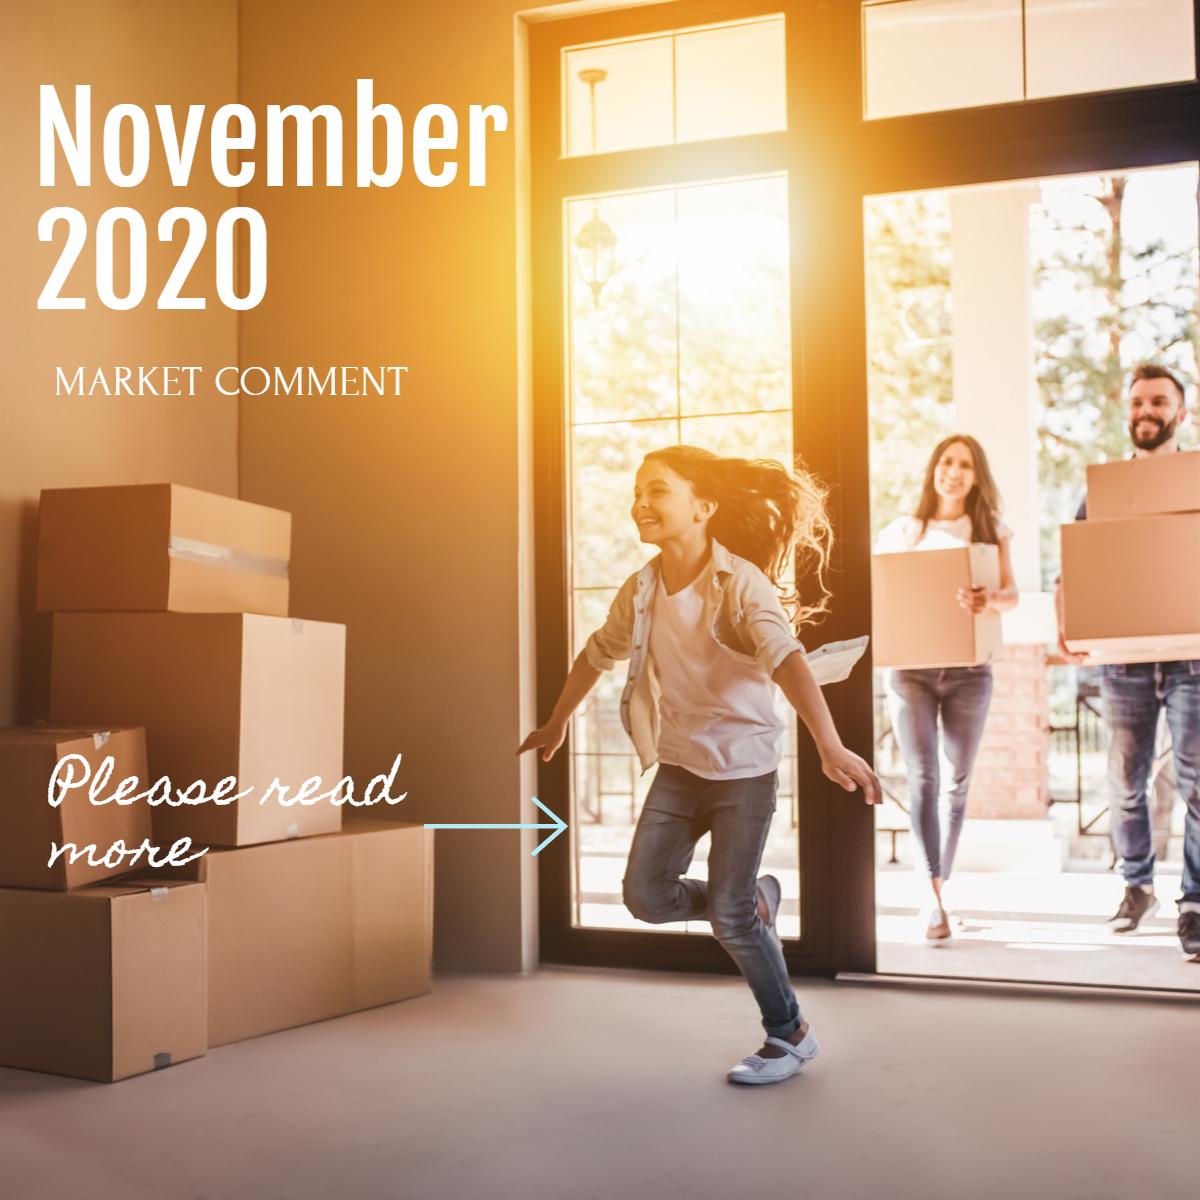 NOVEMBER 2020 MARKET COMMENT